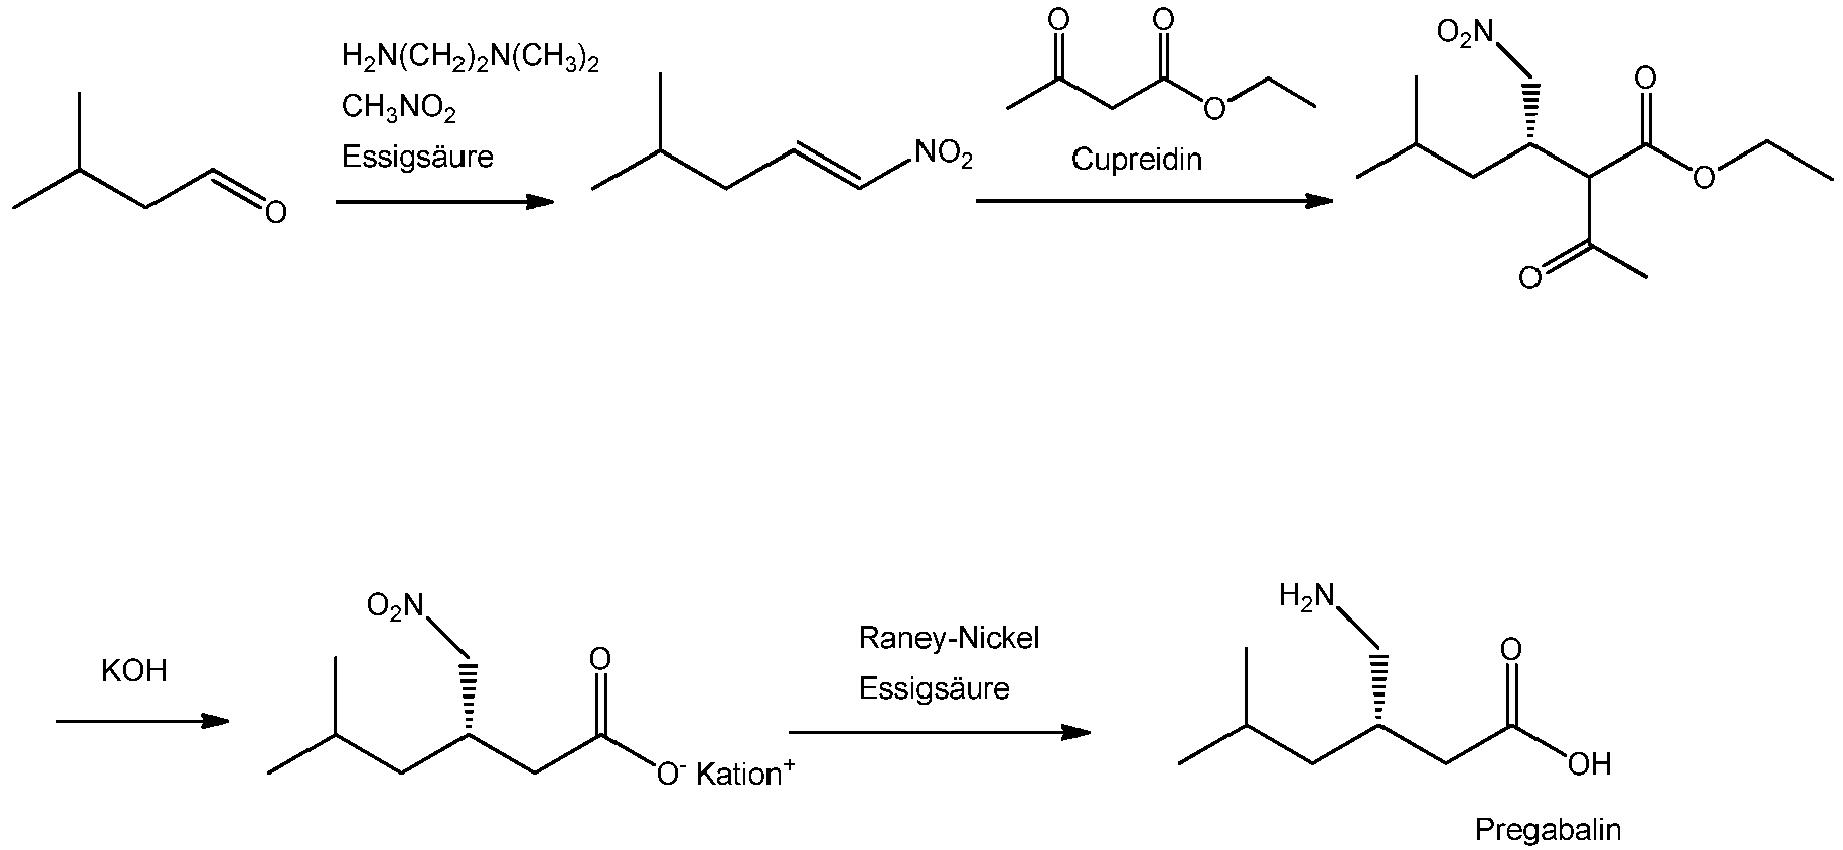 EP3088383A1 - Optimized synthesis of pregabalin and 4-amino